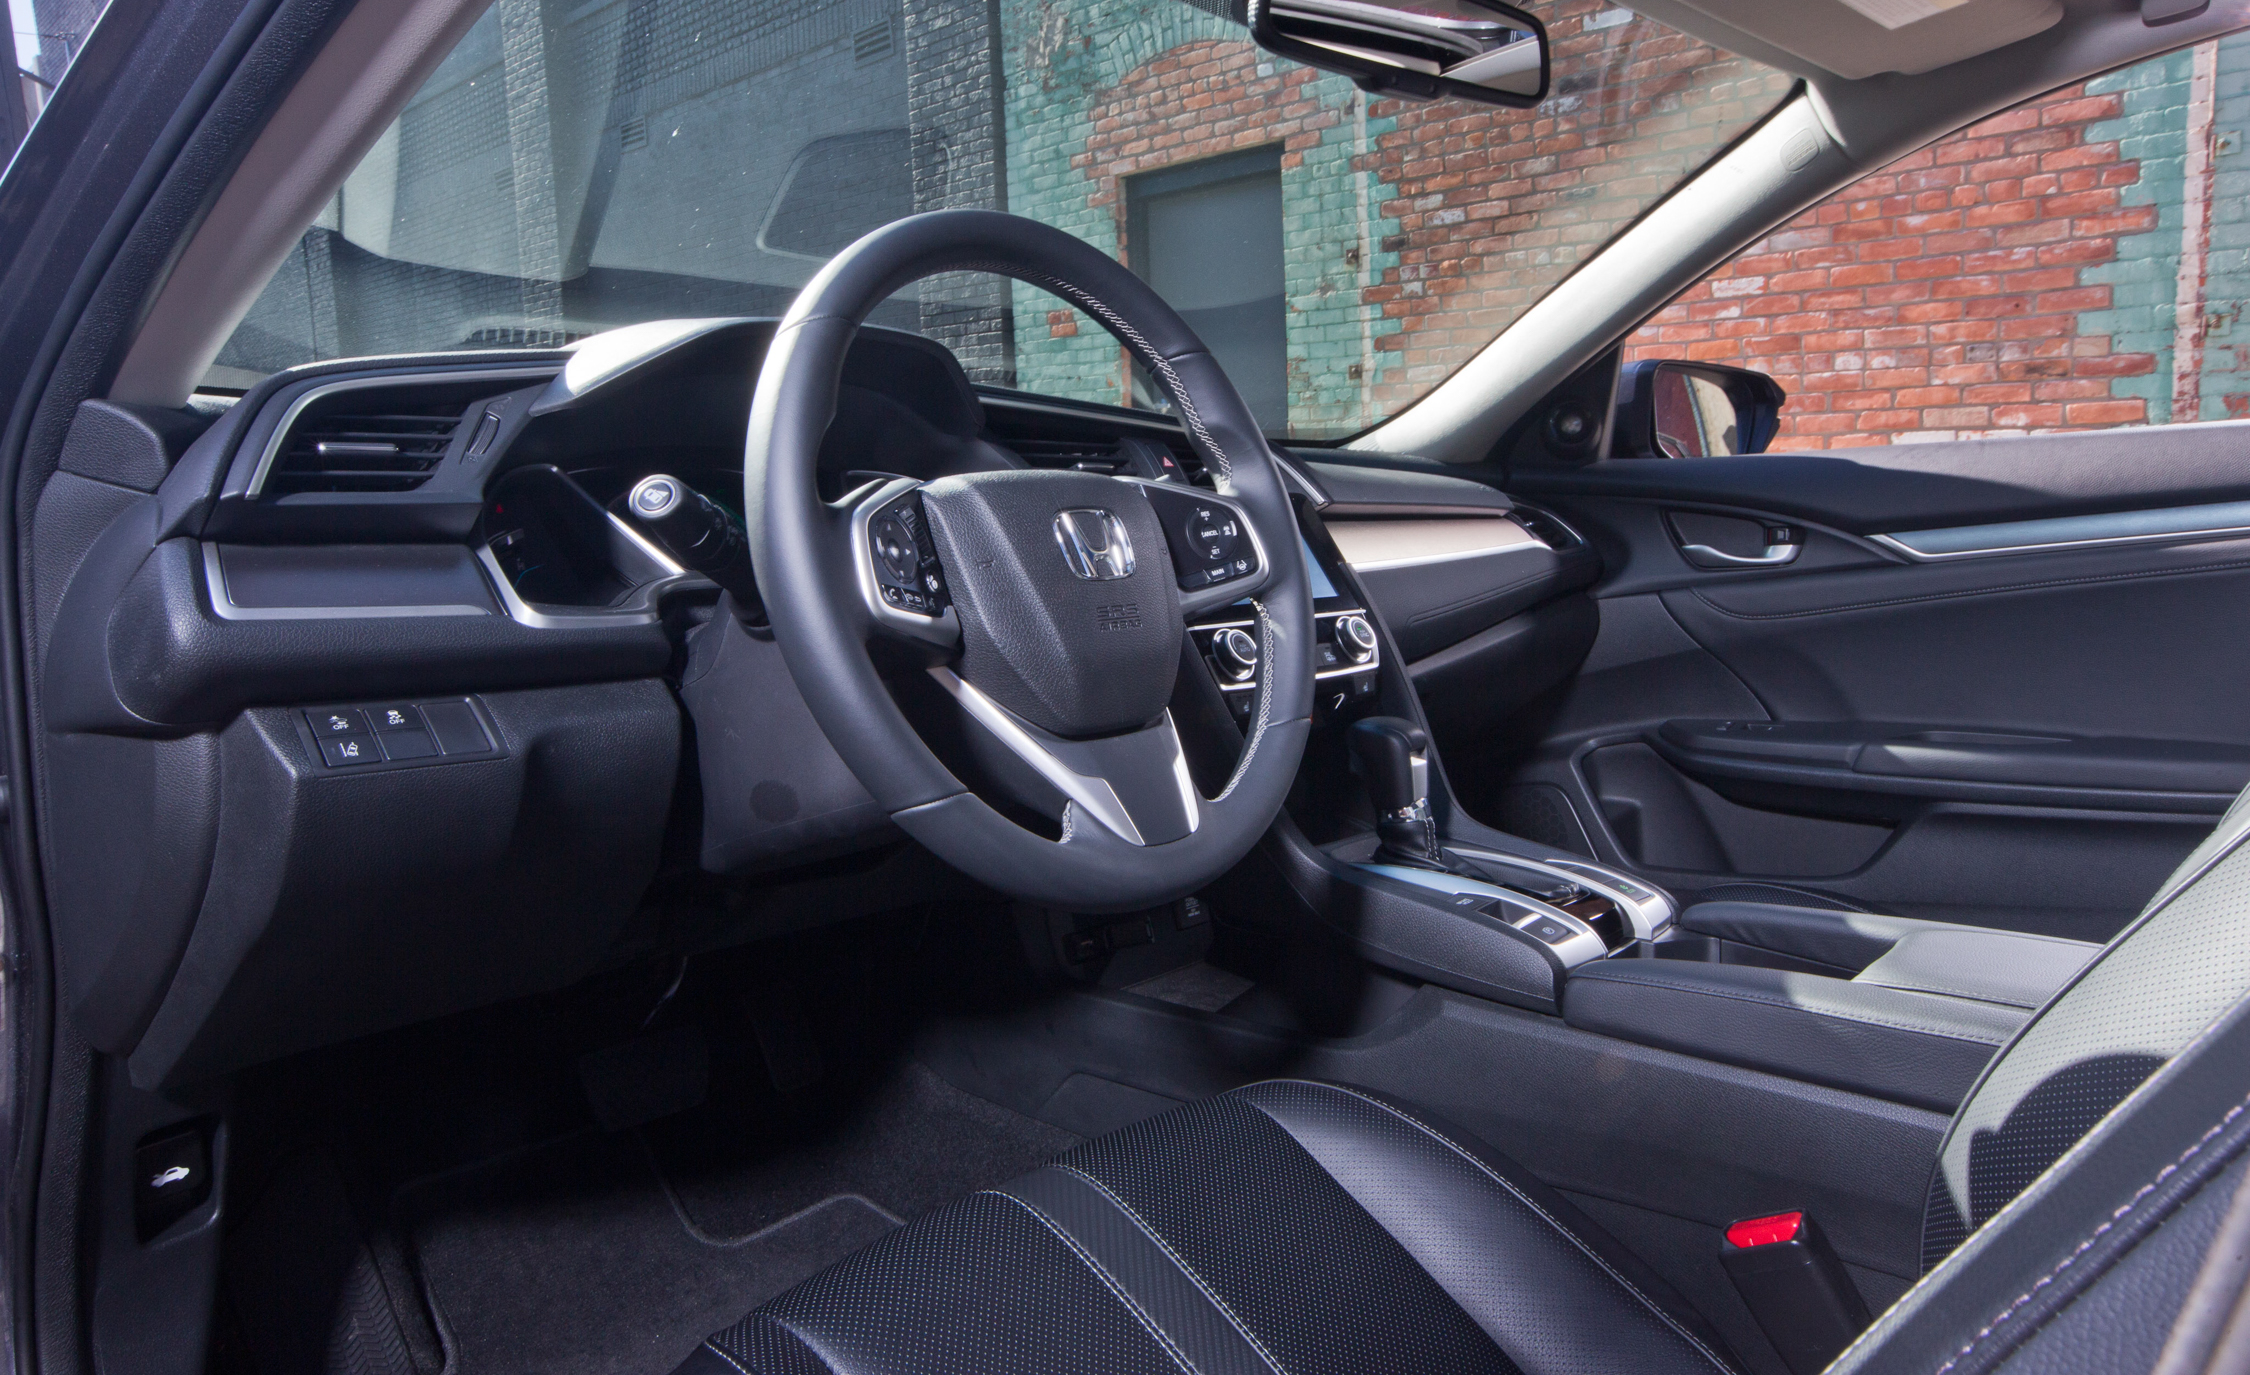 2016 Honda Civic Touring Interior Cockpit